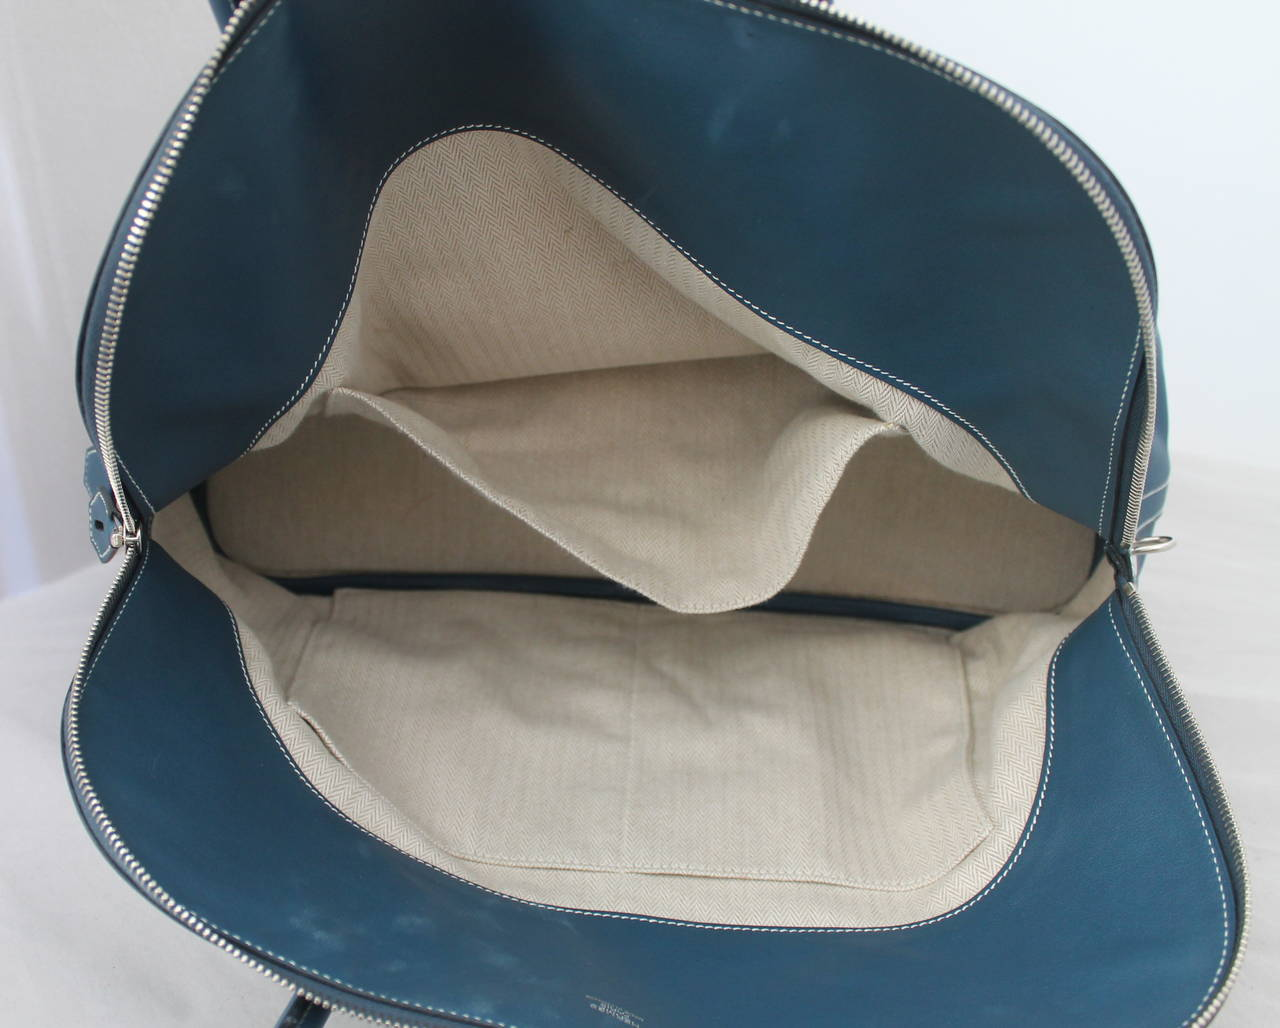 Hermes Thalassa Blue 40cm Veau Swift Bolide Handbag circa 2012 3